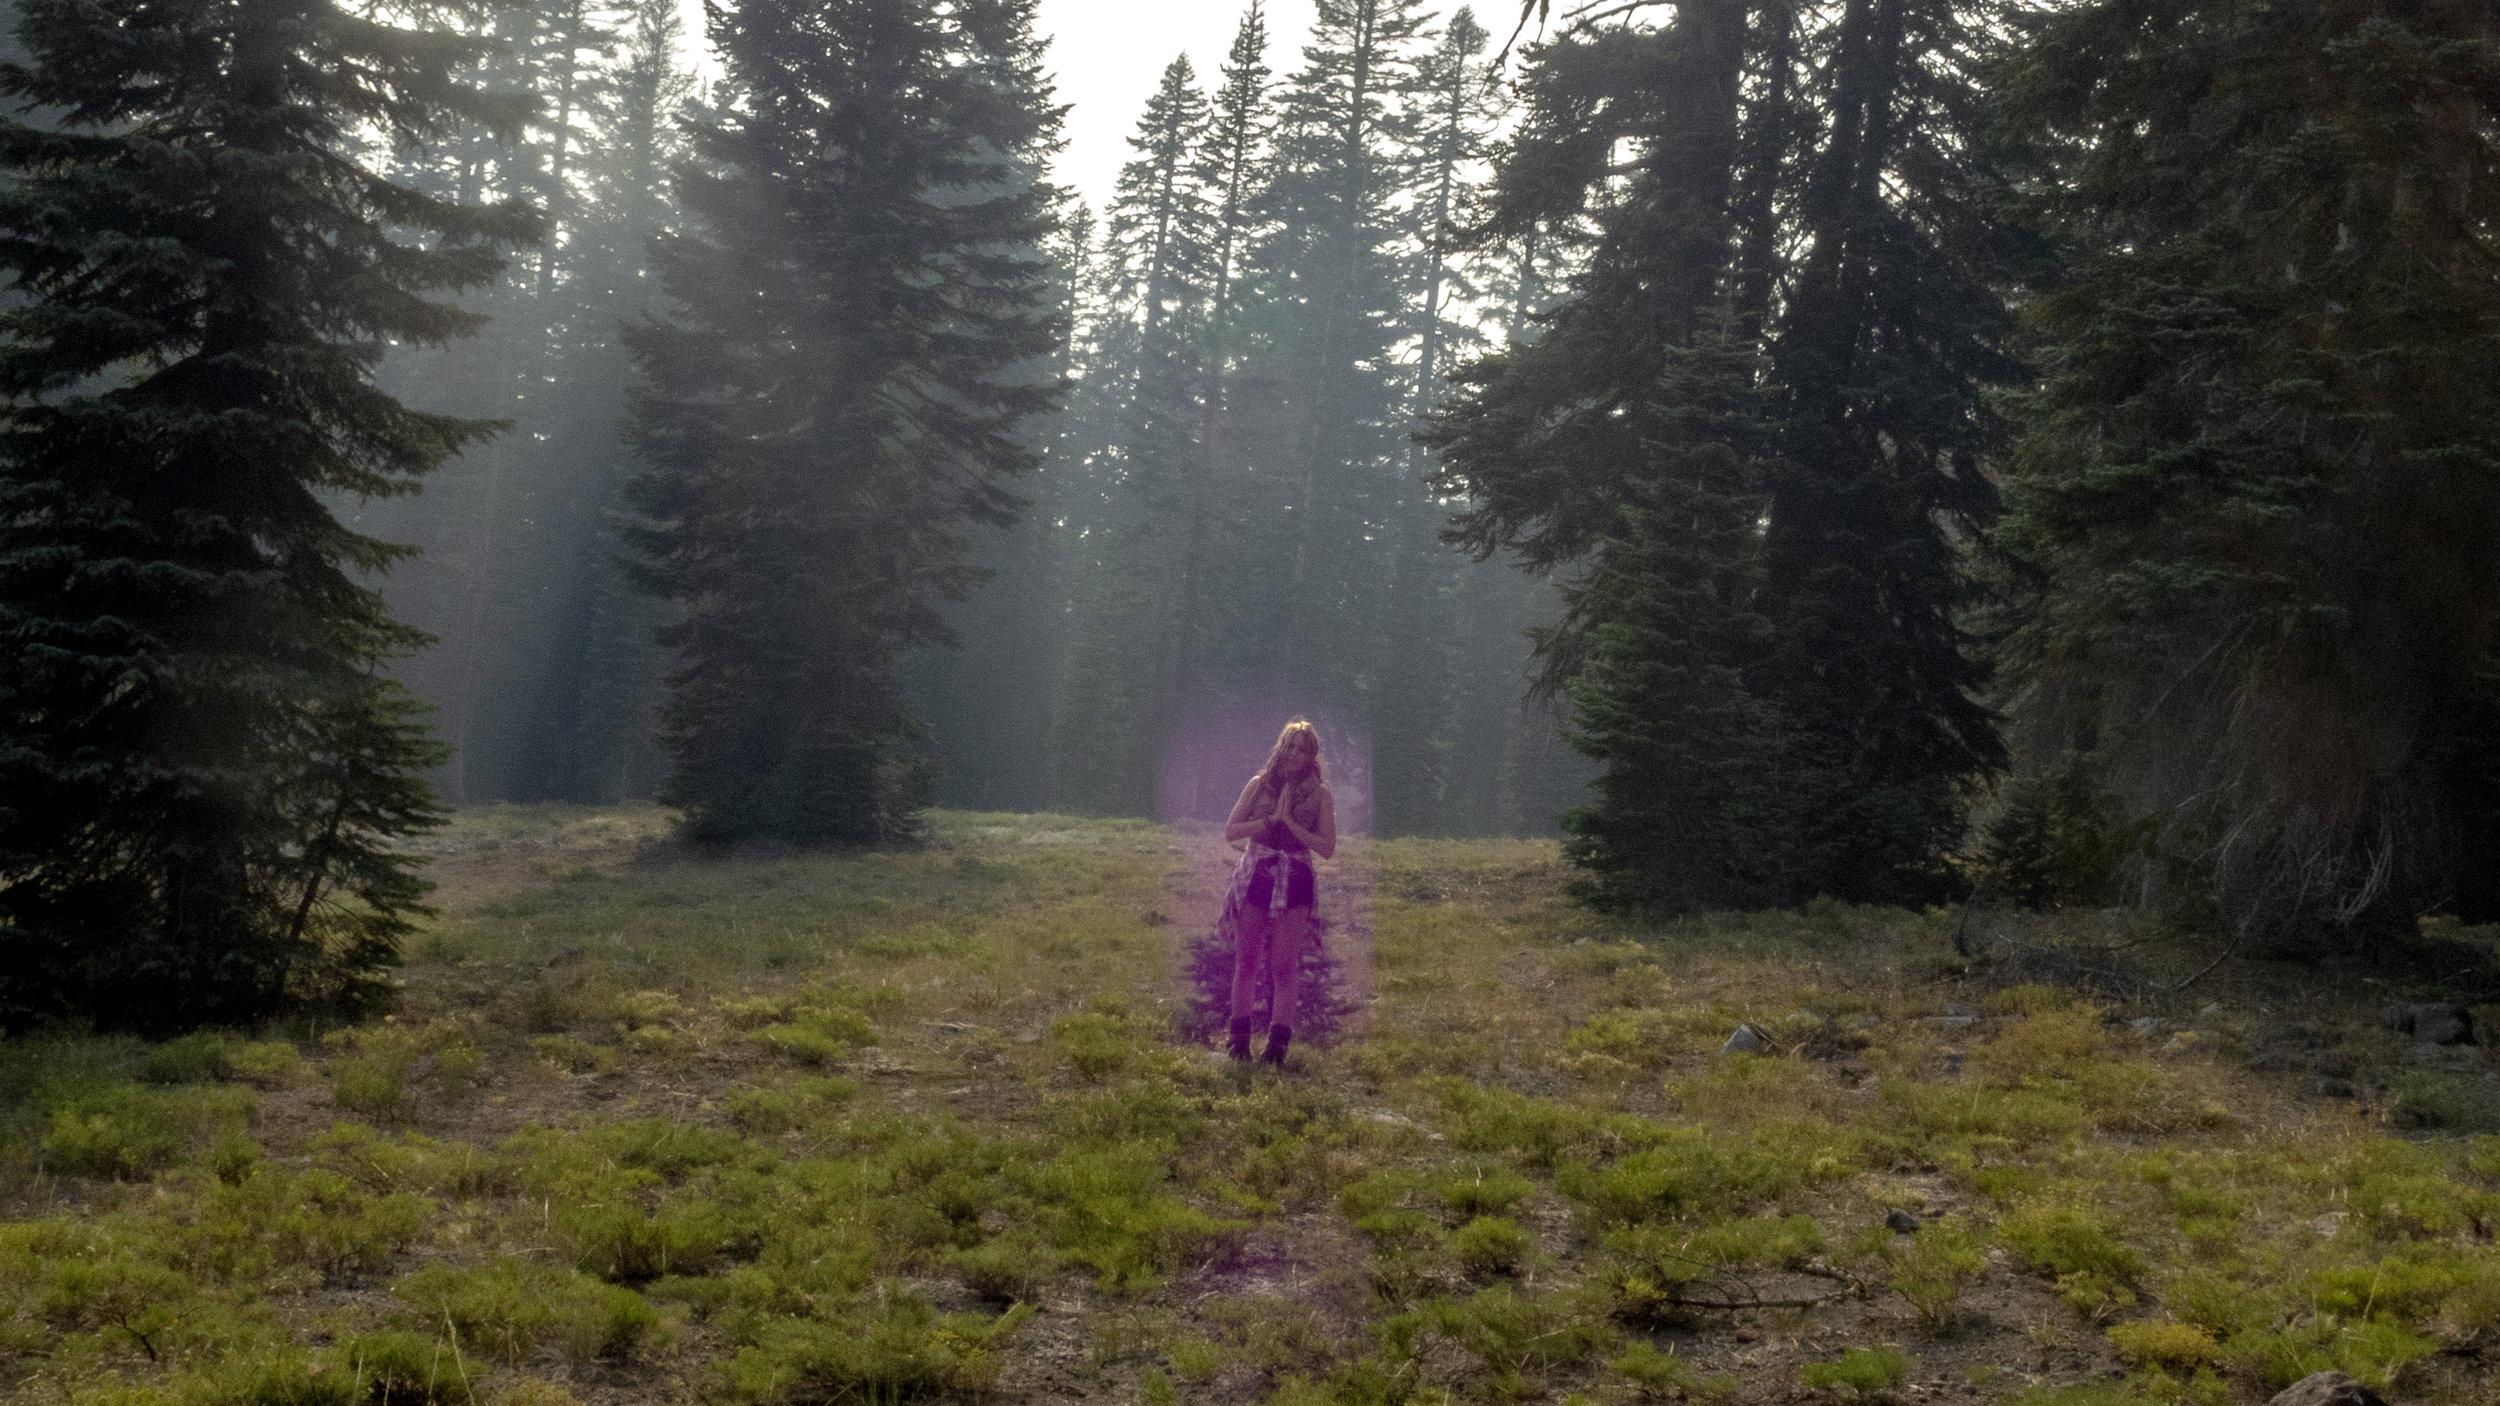 The Violet Flame on Mount Shasta